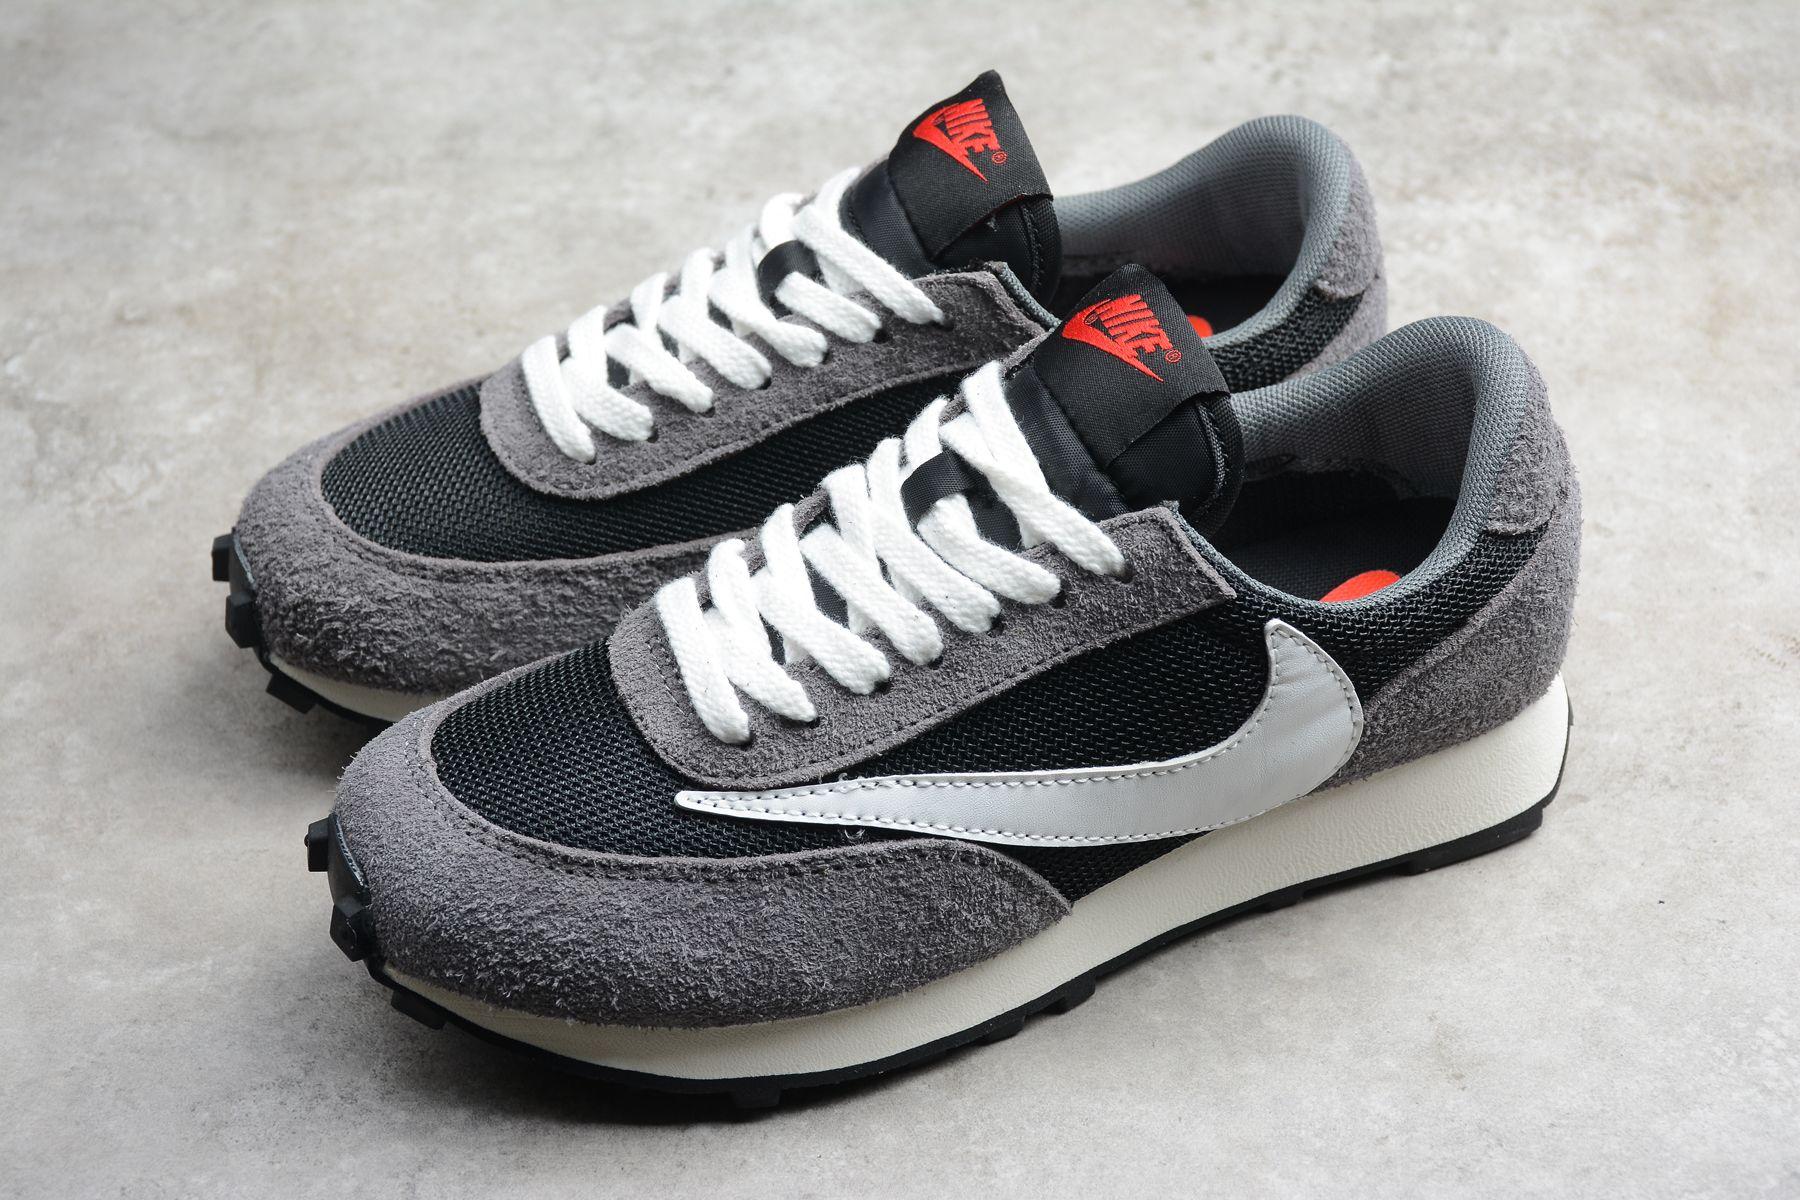 Men's and women's Nike Daybreak SP gray black and white